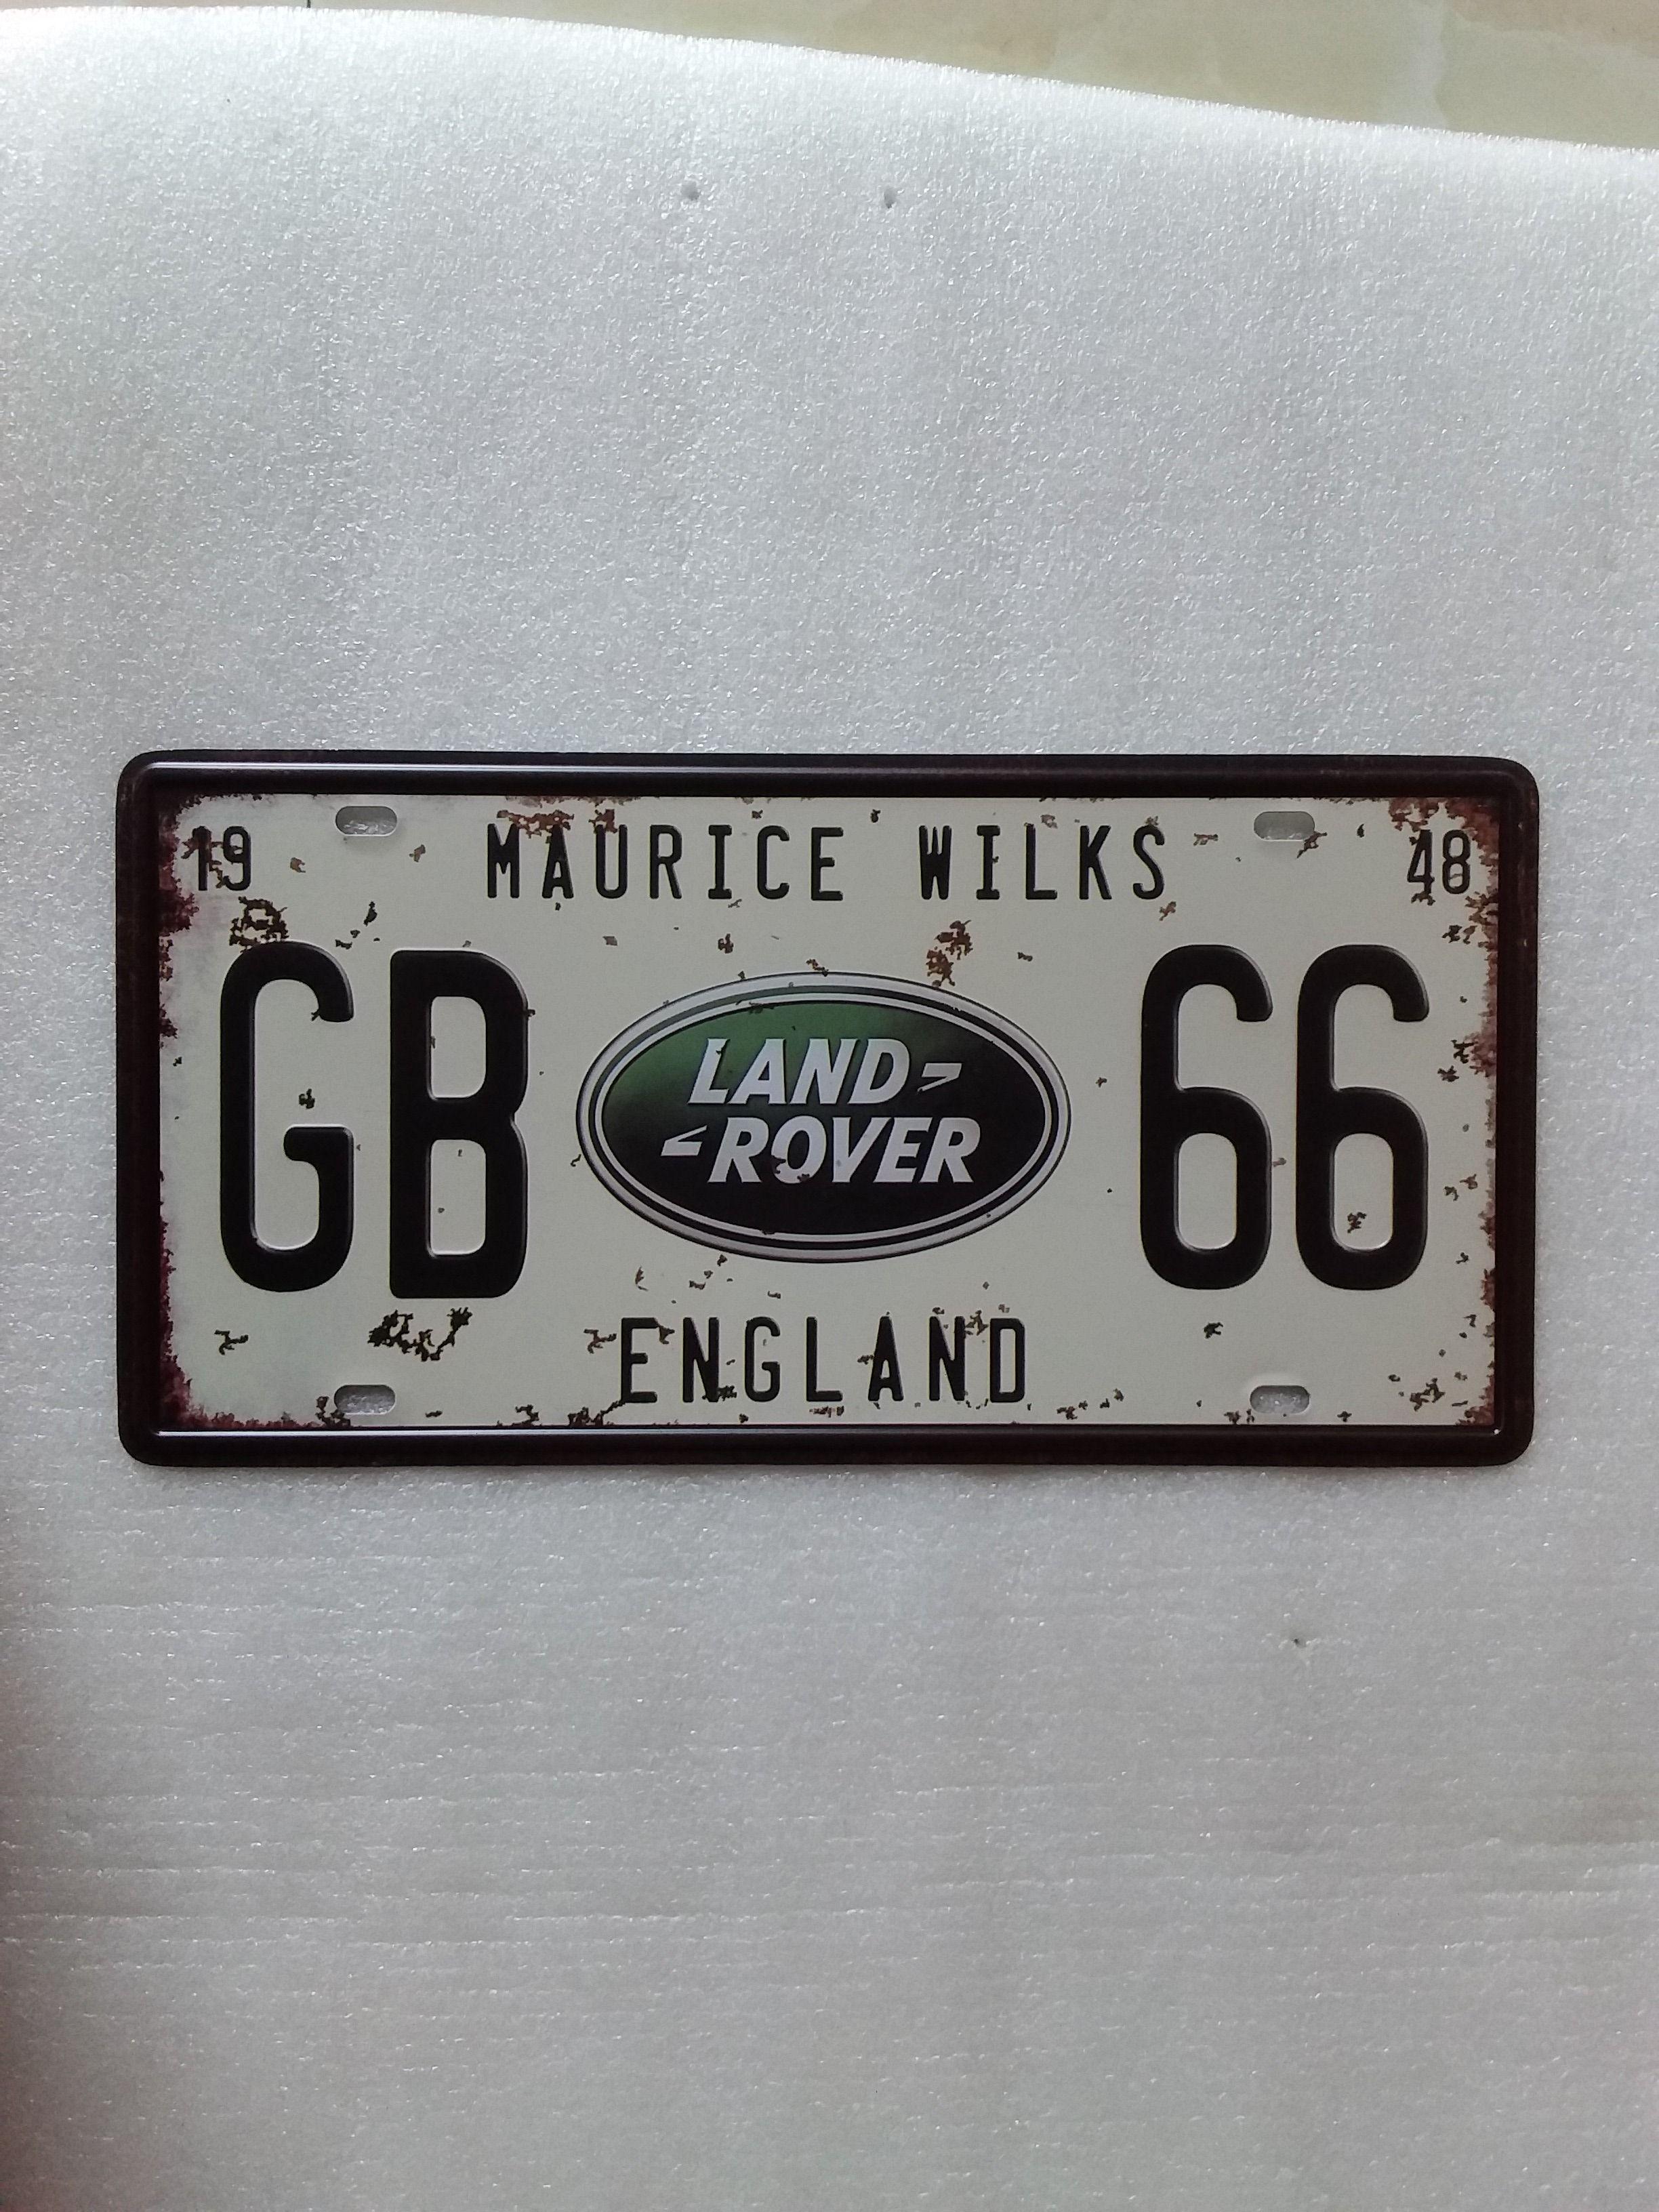 2018 Gb 66 England Maurice Wilks Vintage Metal Plaque Car Number ...